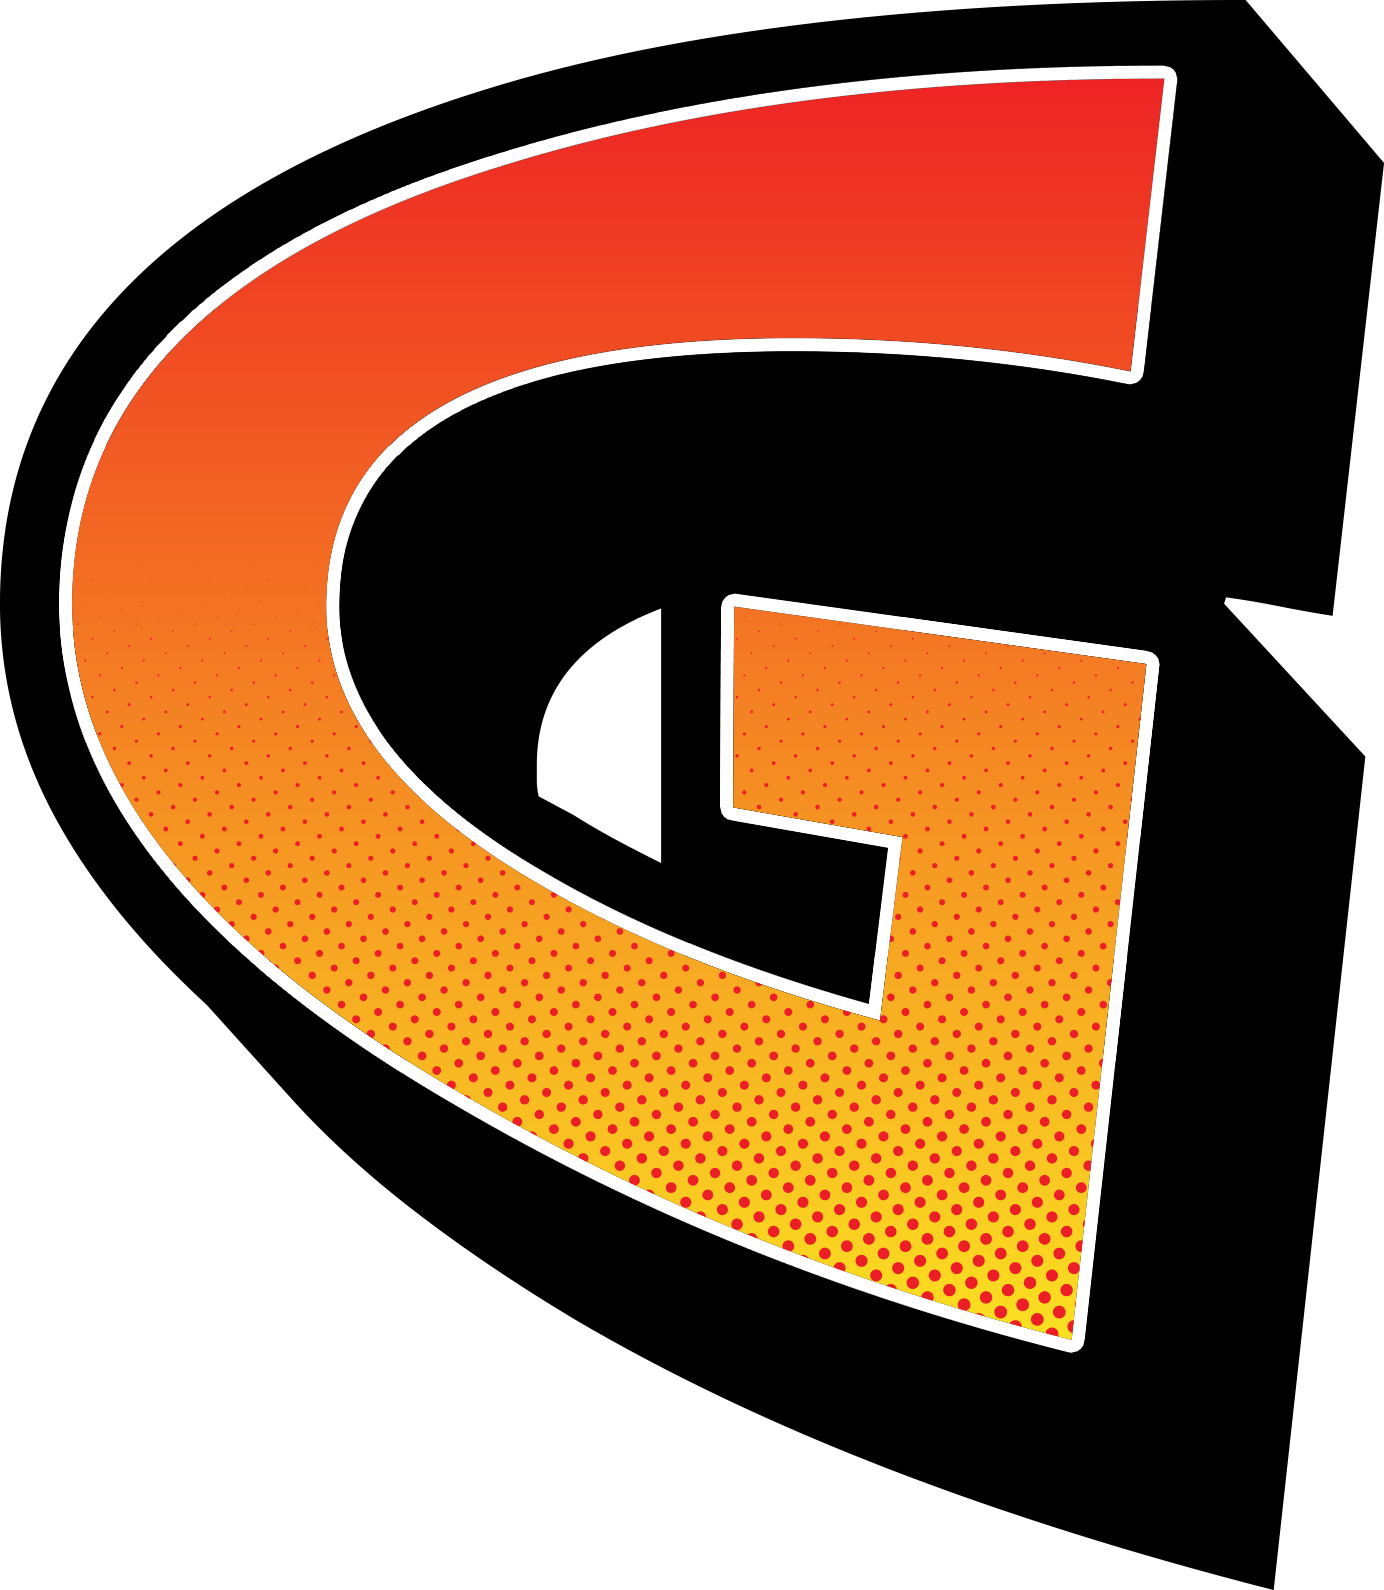 free download Comics YouTube Comic book Alphabet Symbol